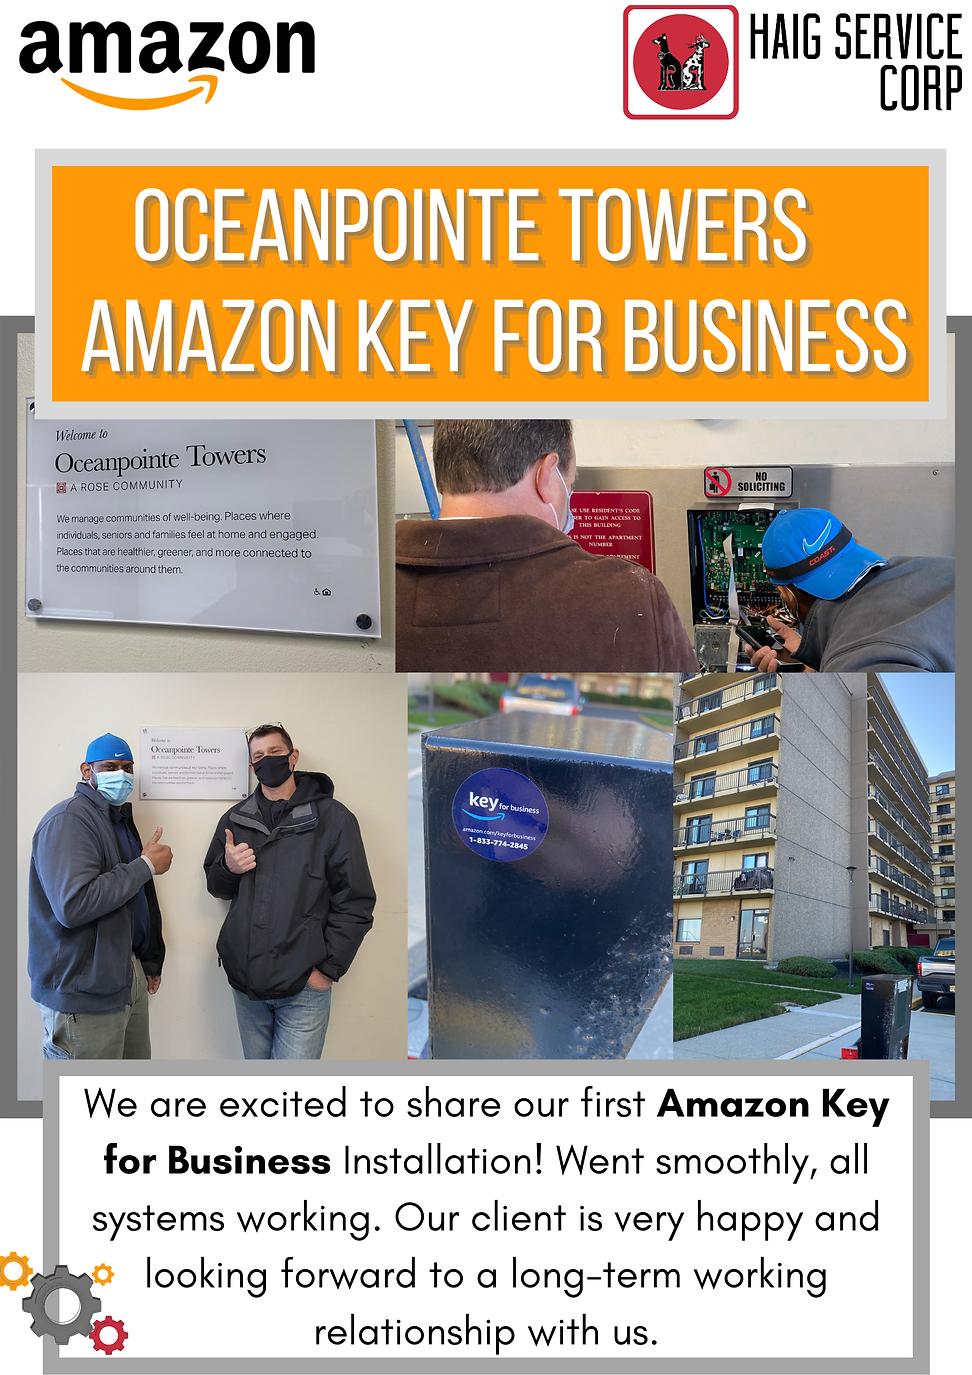 Amazon KFB Installation 1.png